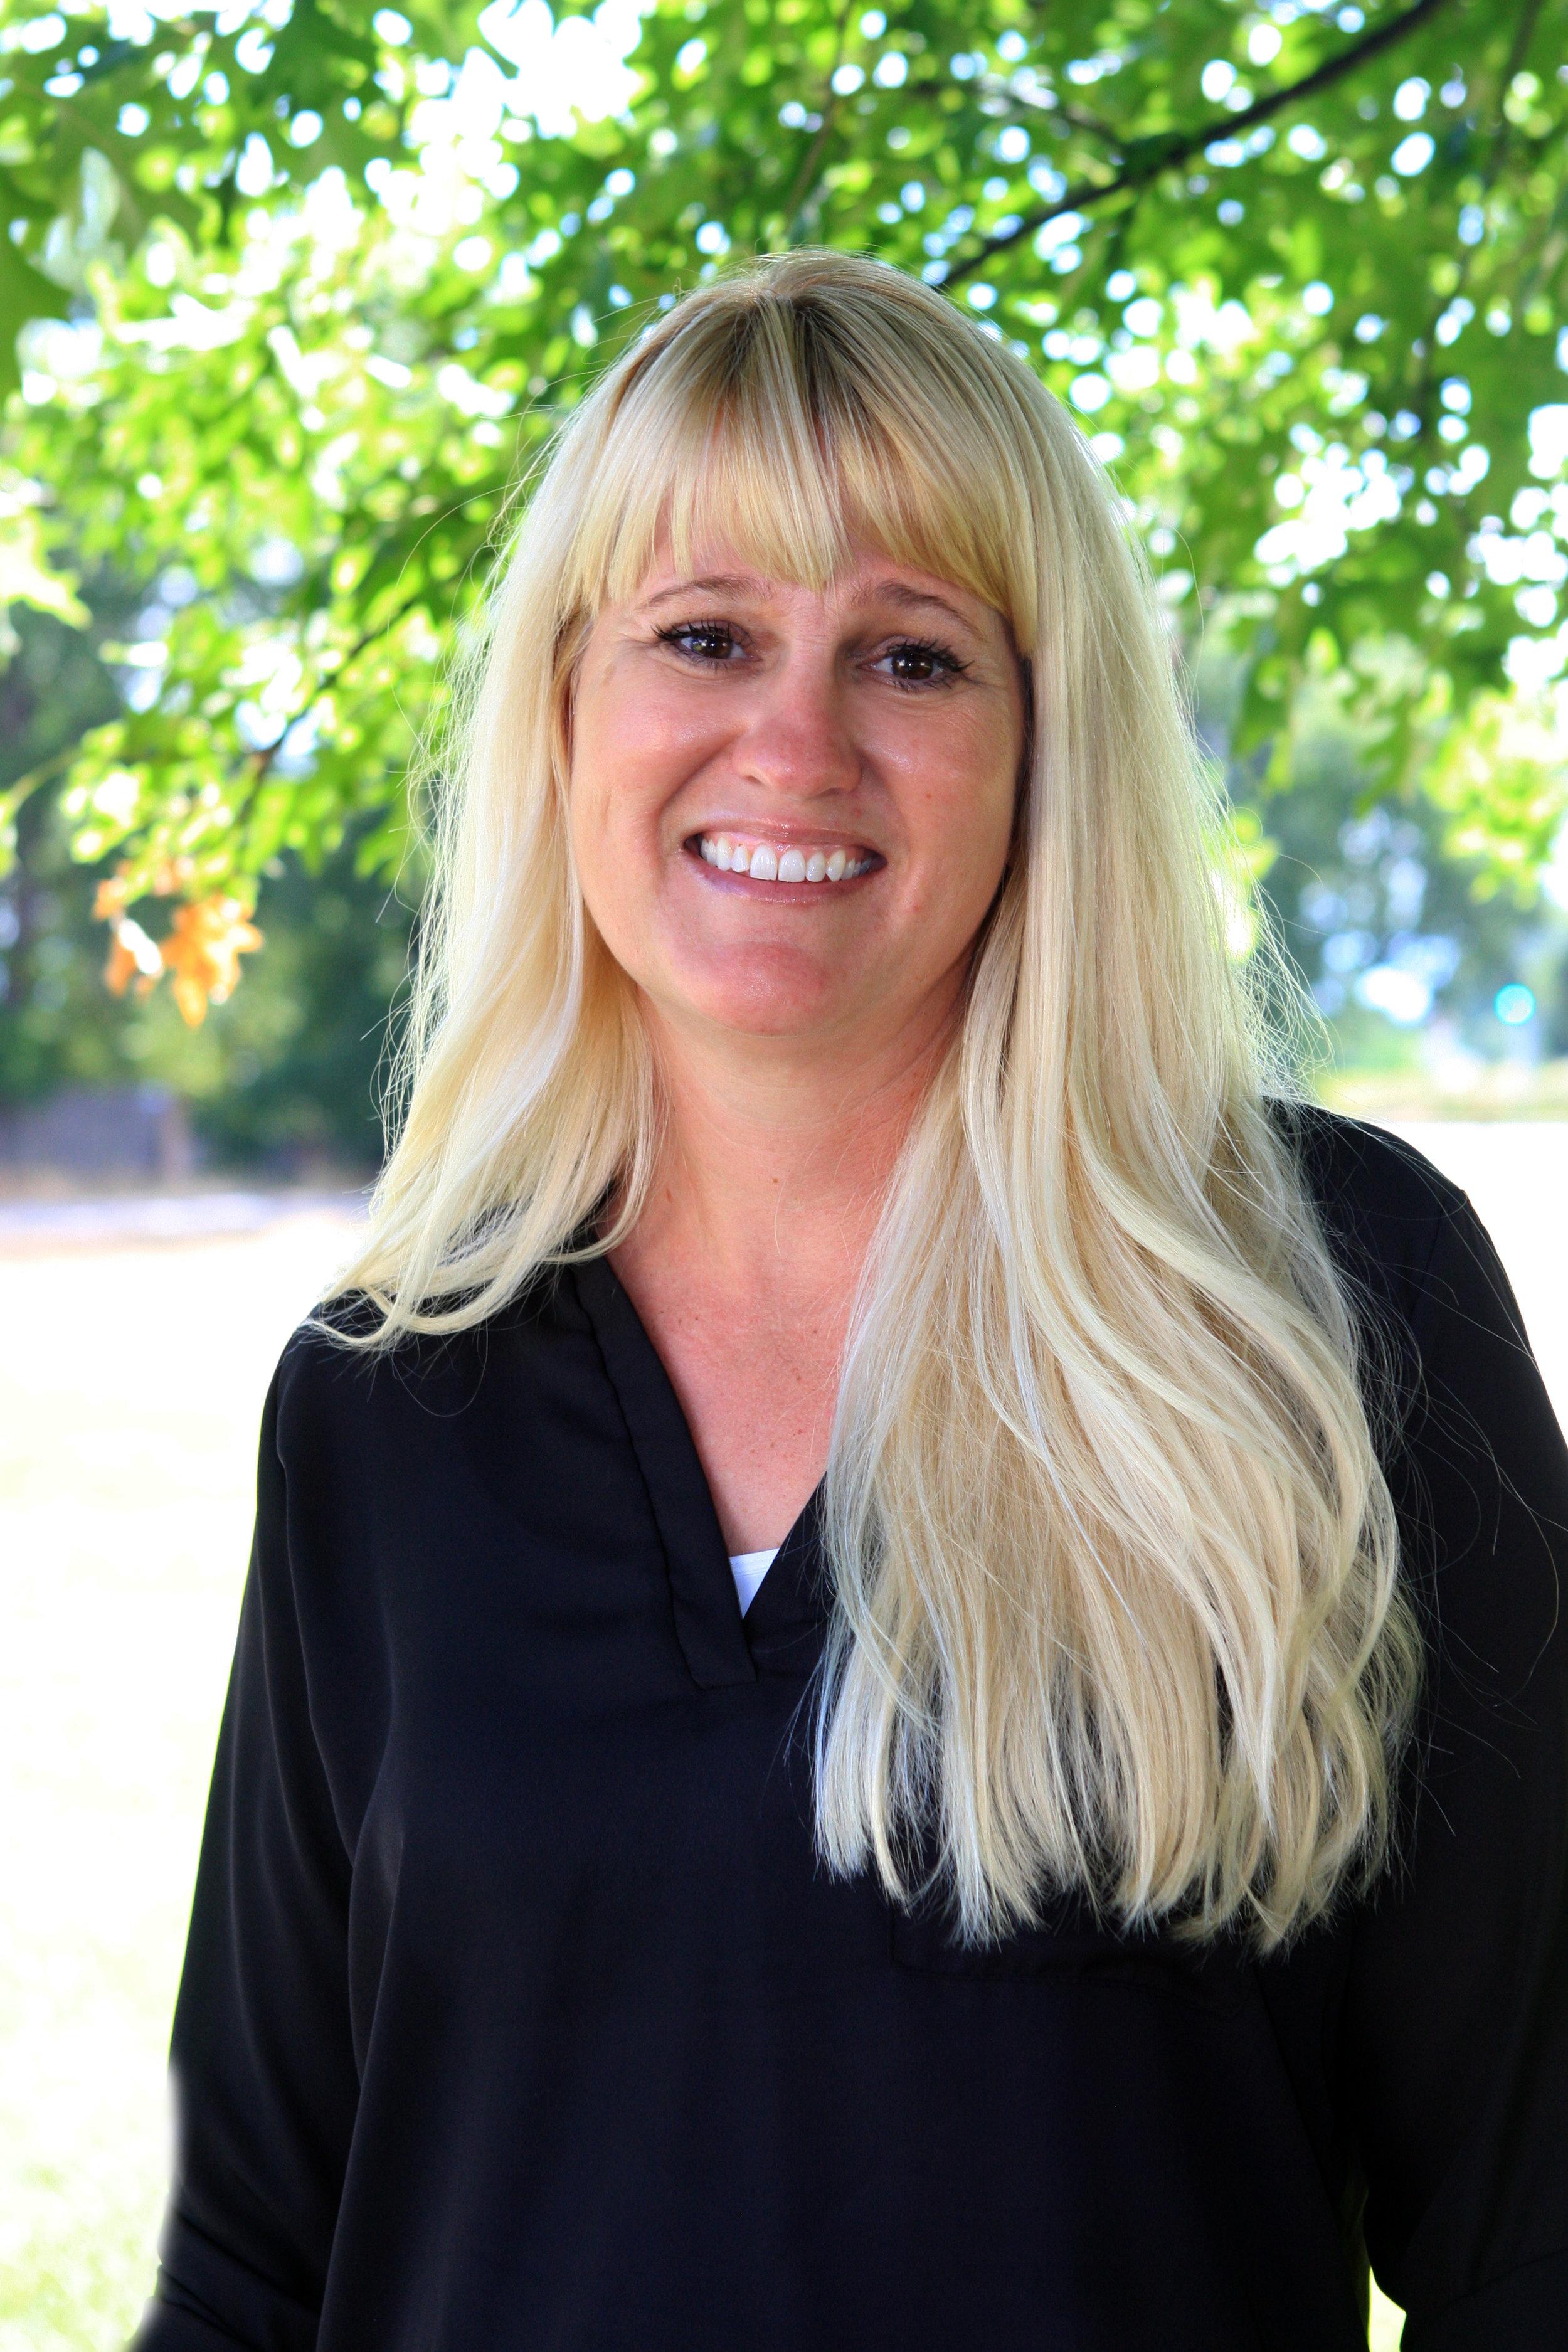 <p><strong>Valerie Taylor</strong><br>Resource Center Coordinator<br><a href=mailto:valeriet@ndaemail.com>valeriet@ndaemail.com</a></p>